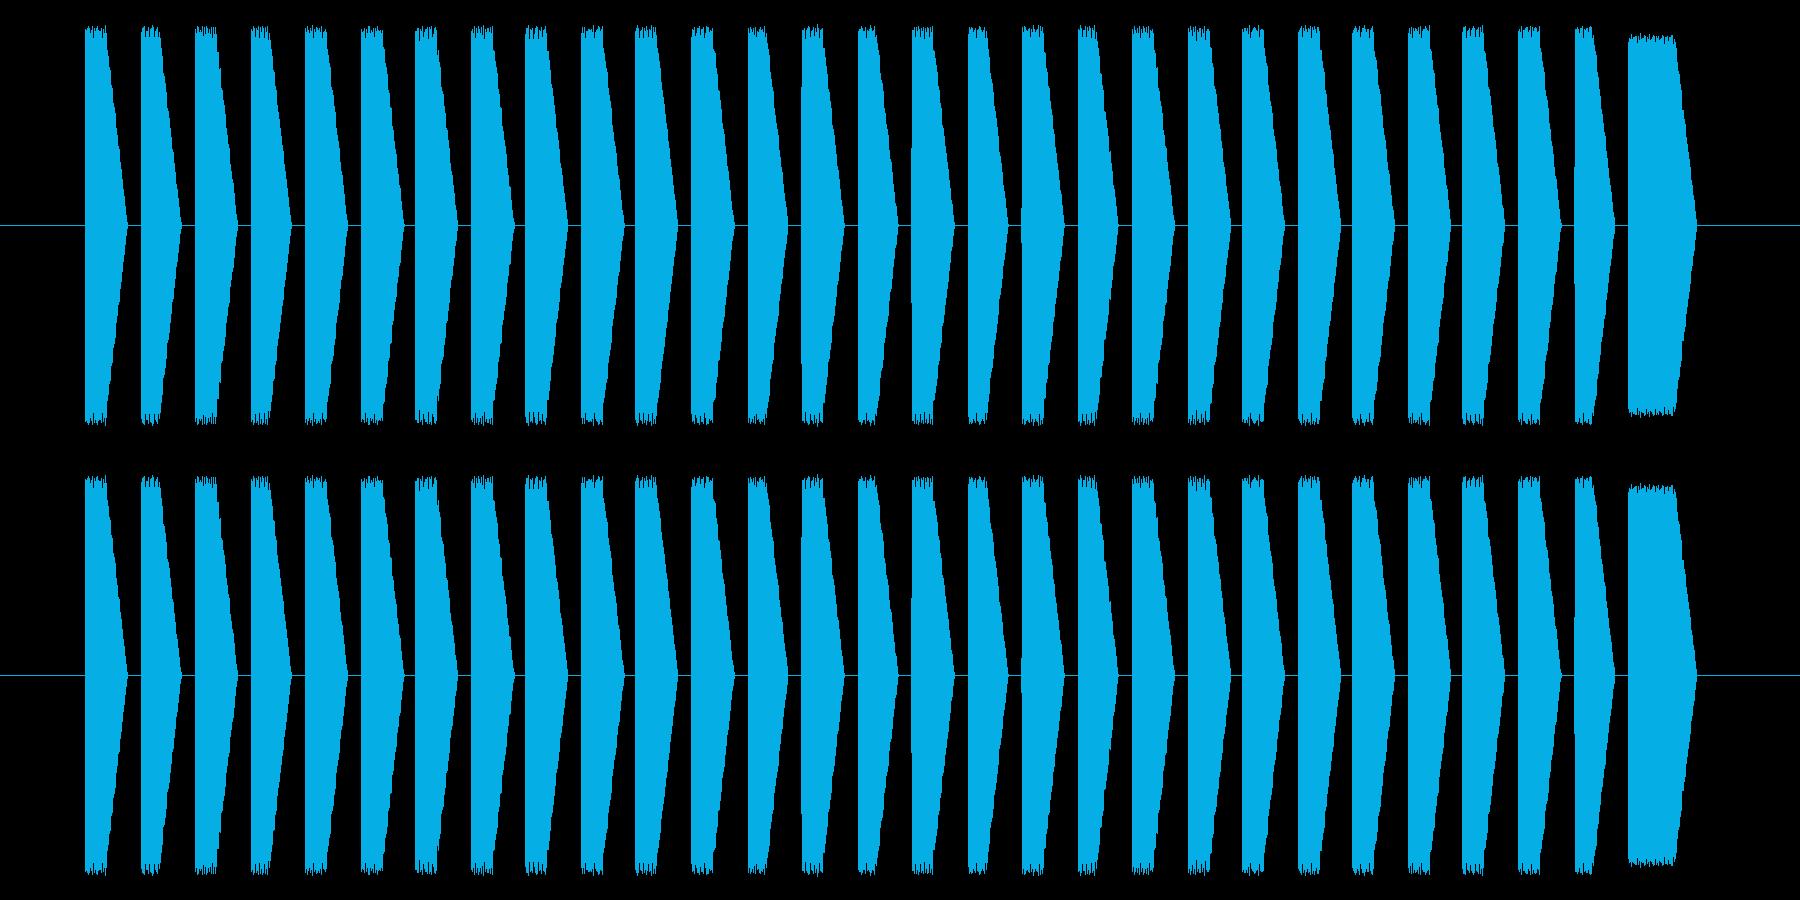 NES シューティング01-9(スコア)の再生済みの波形